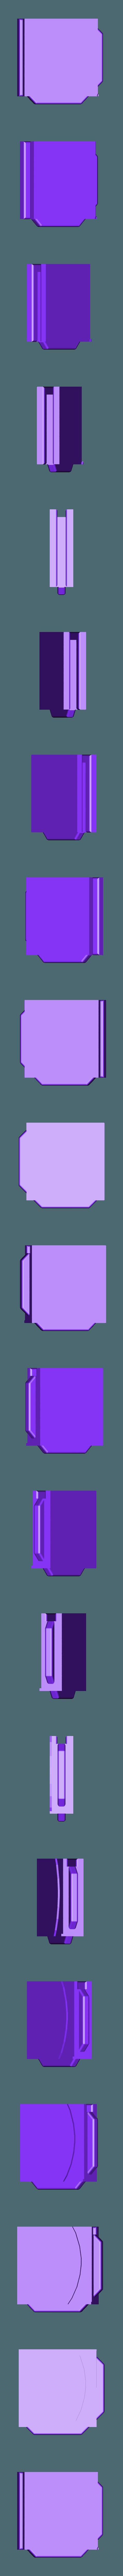 Piece - Part 14.stl Download free STL file Taquin CULTS / Sliding Puzzle • 3D print model, Valelab3D